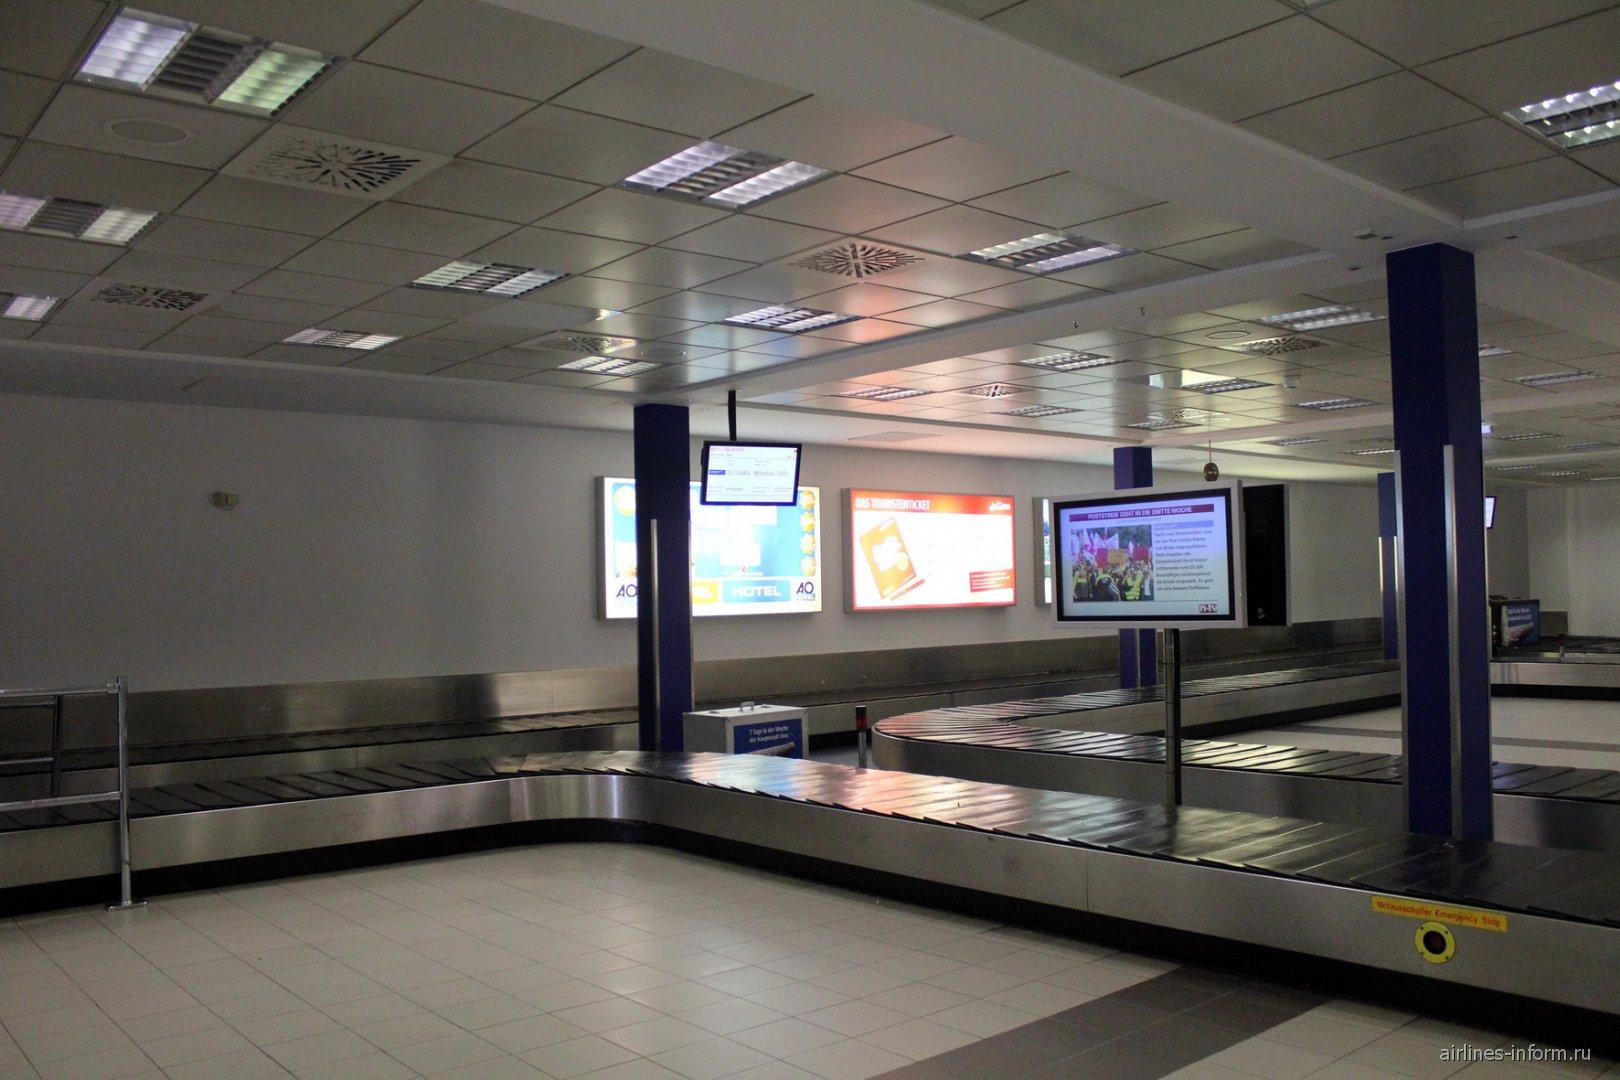 Зал выдачи багажа в аэропорту Берлин Шёнефельд